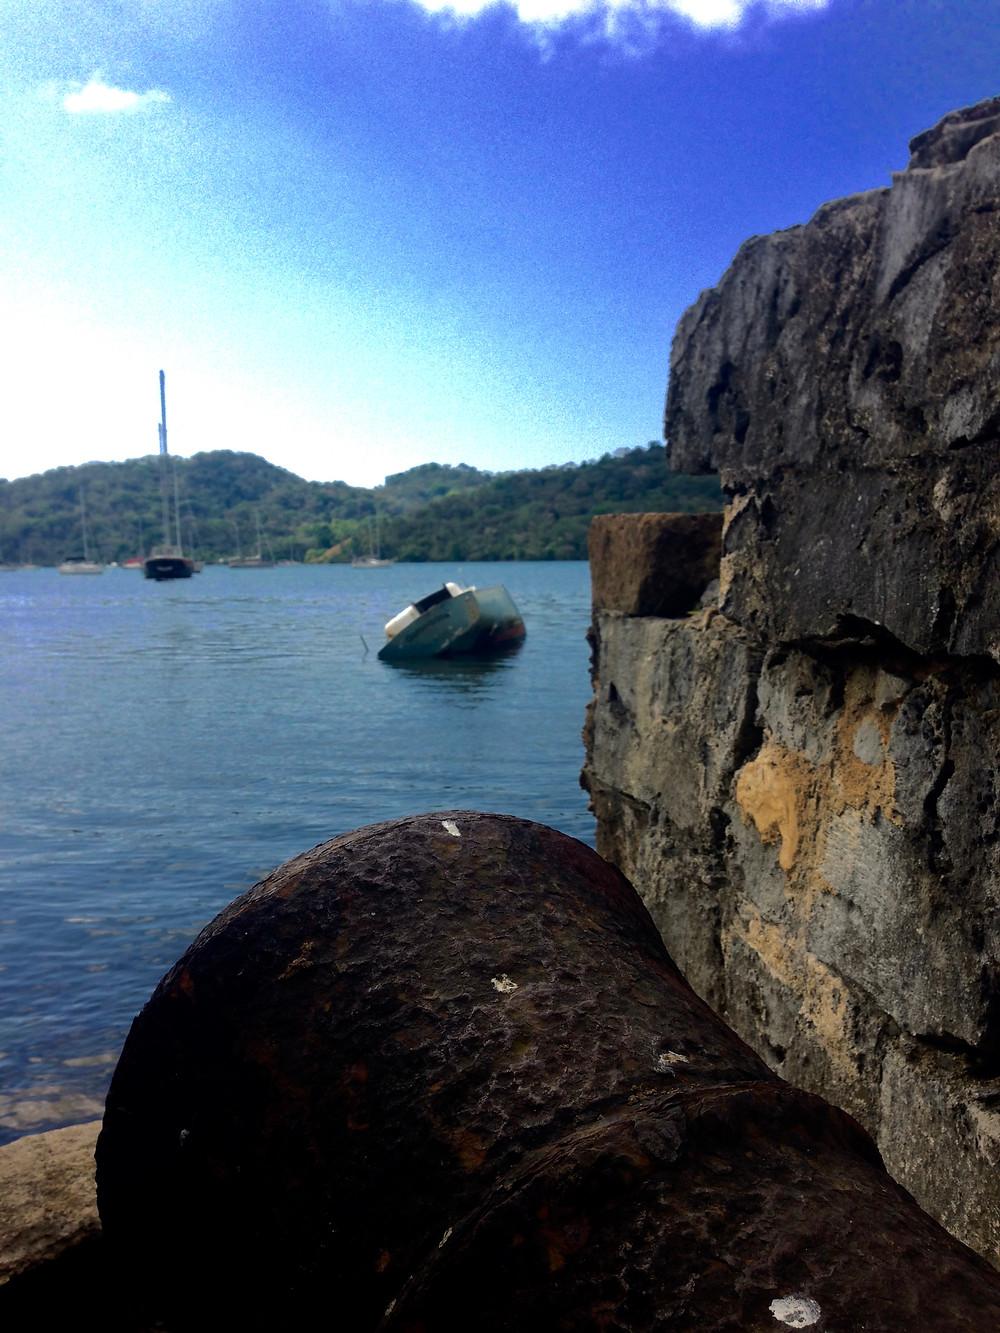 Portobelo seems to be a sinking port...